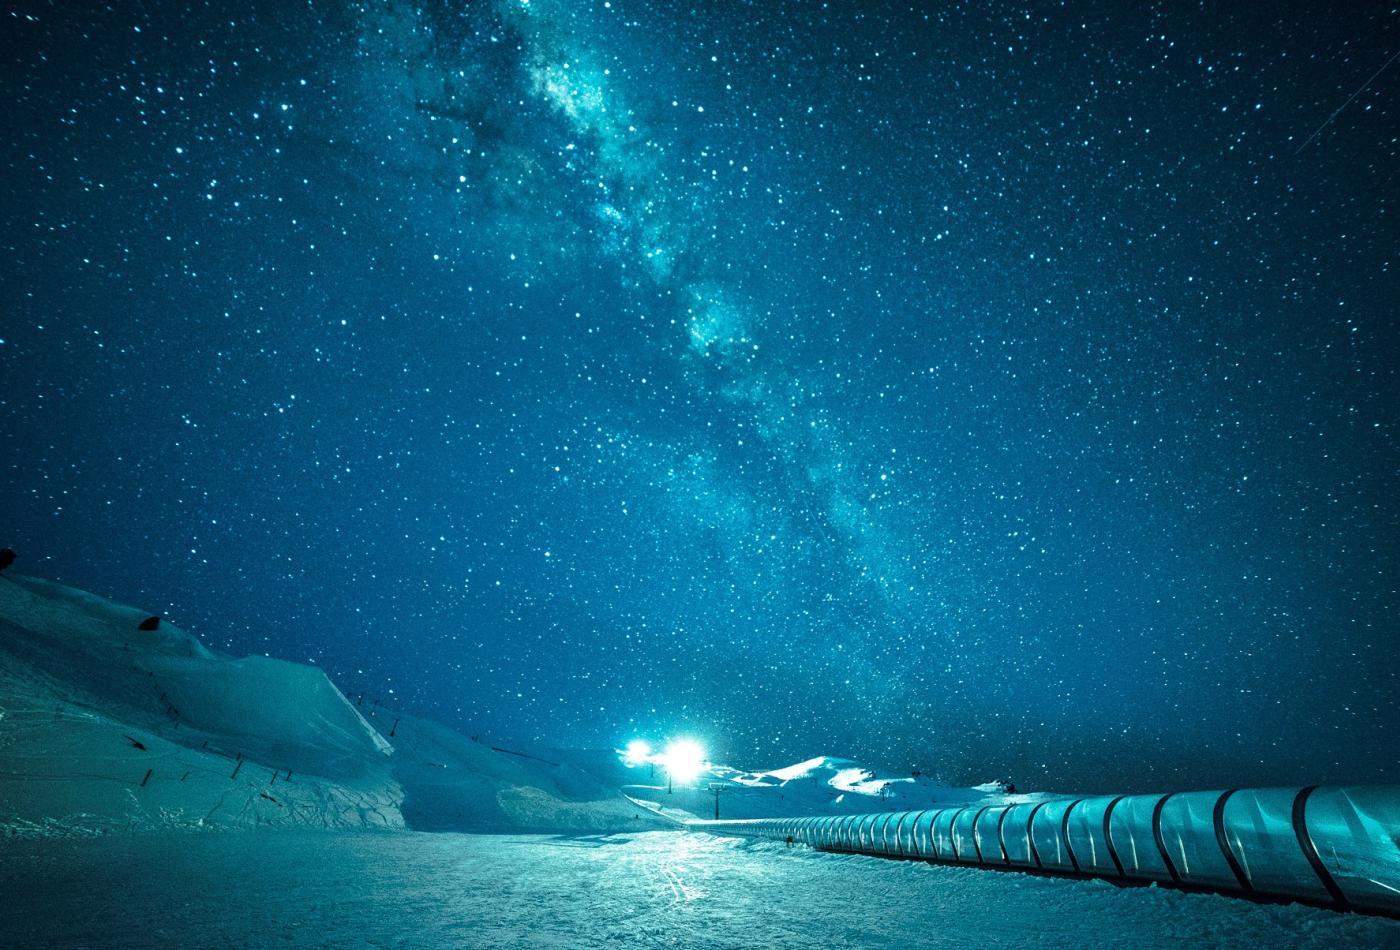 Milky Way over Cardrona ski field